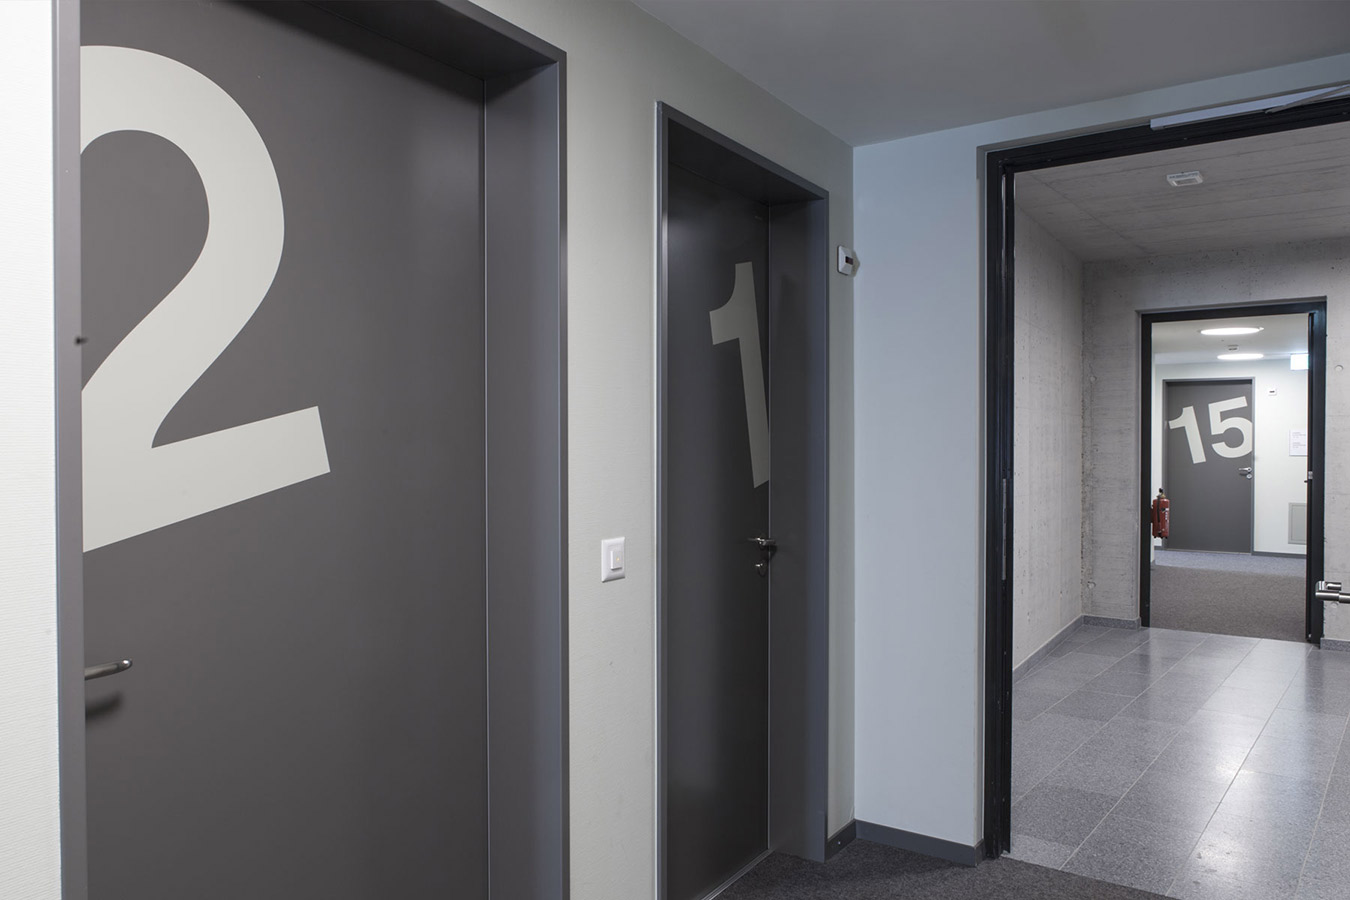 Hunziker Areal Signaletik Innen Treppenhaus